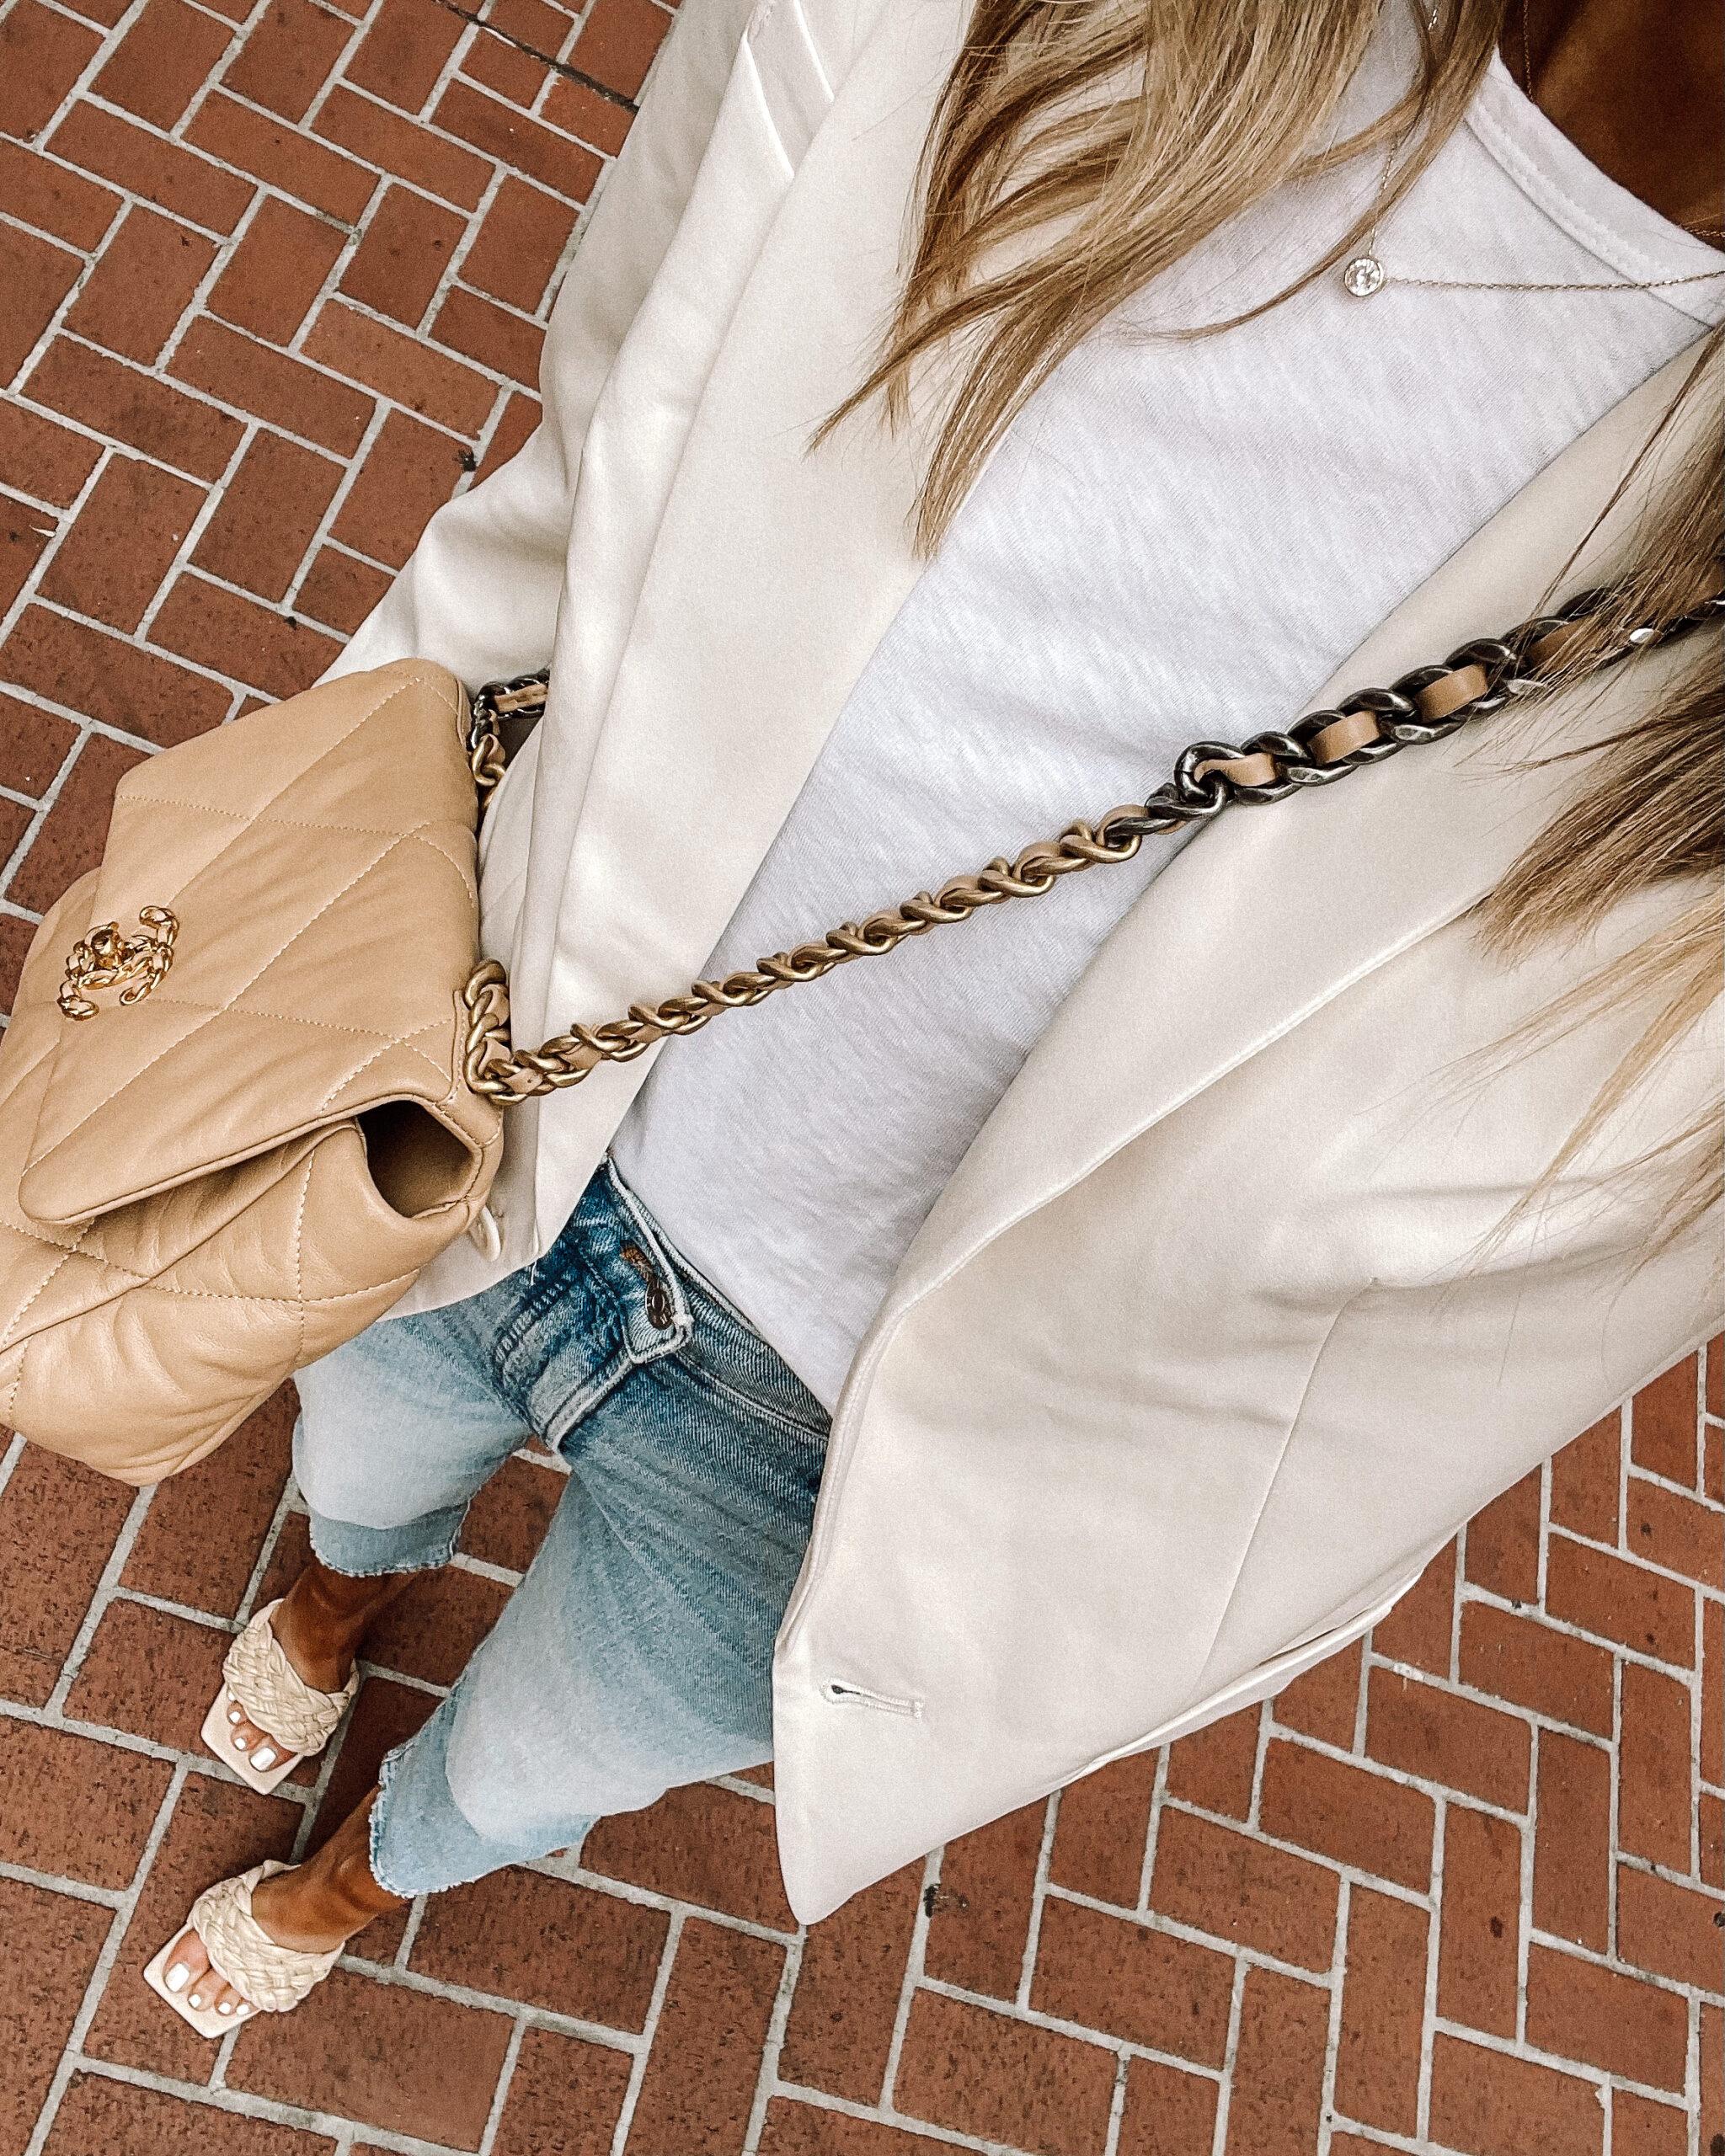 Fashion Jackson Wearing White Blazer White Tshirt Jeans White Quilted Sandals Chanel Handbag